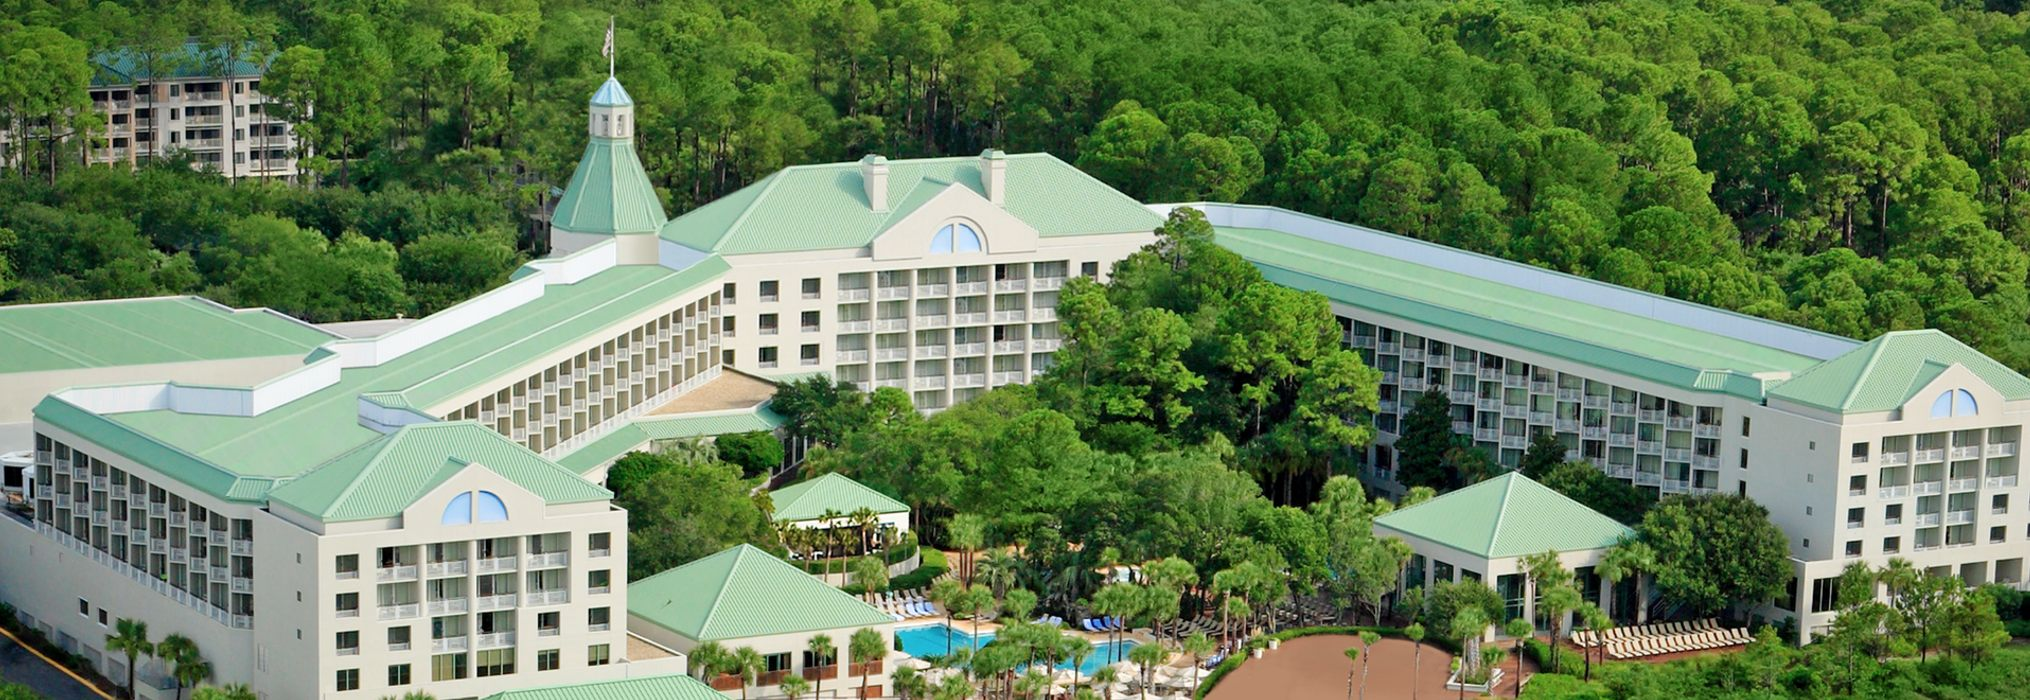 The Westin Hilton Head Island Resort & Spa - Work & Travel Year USA